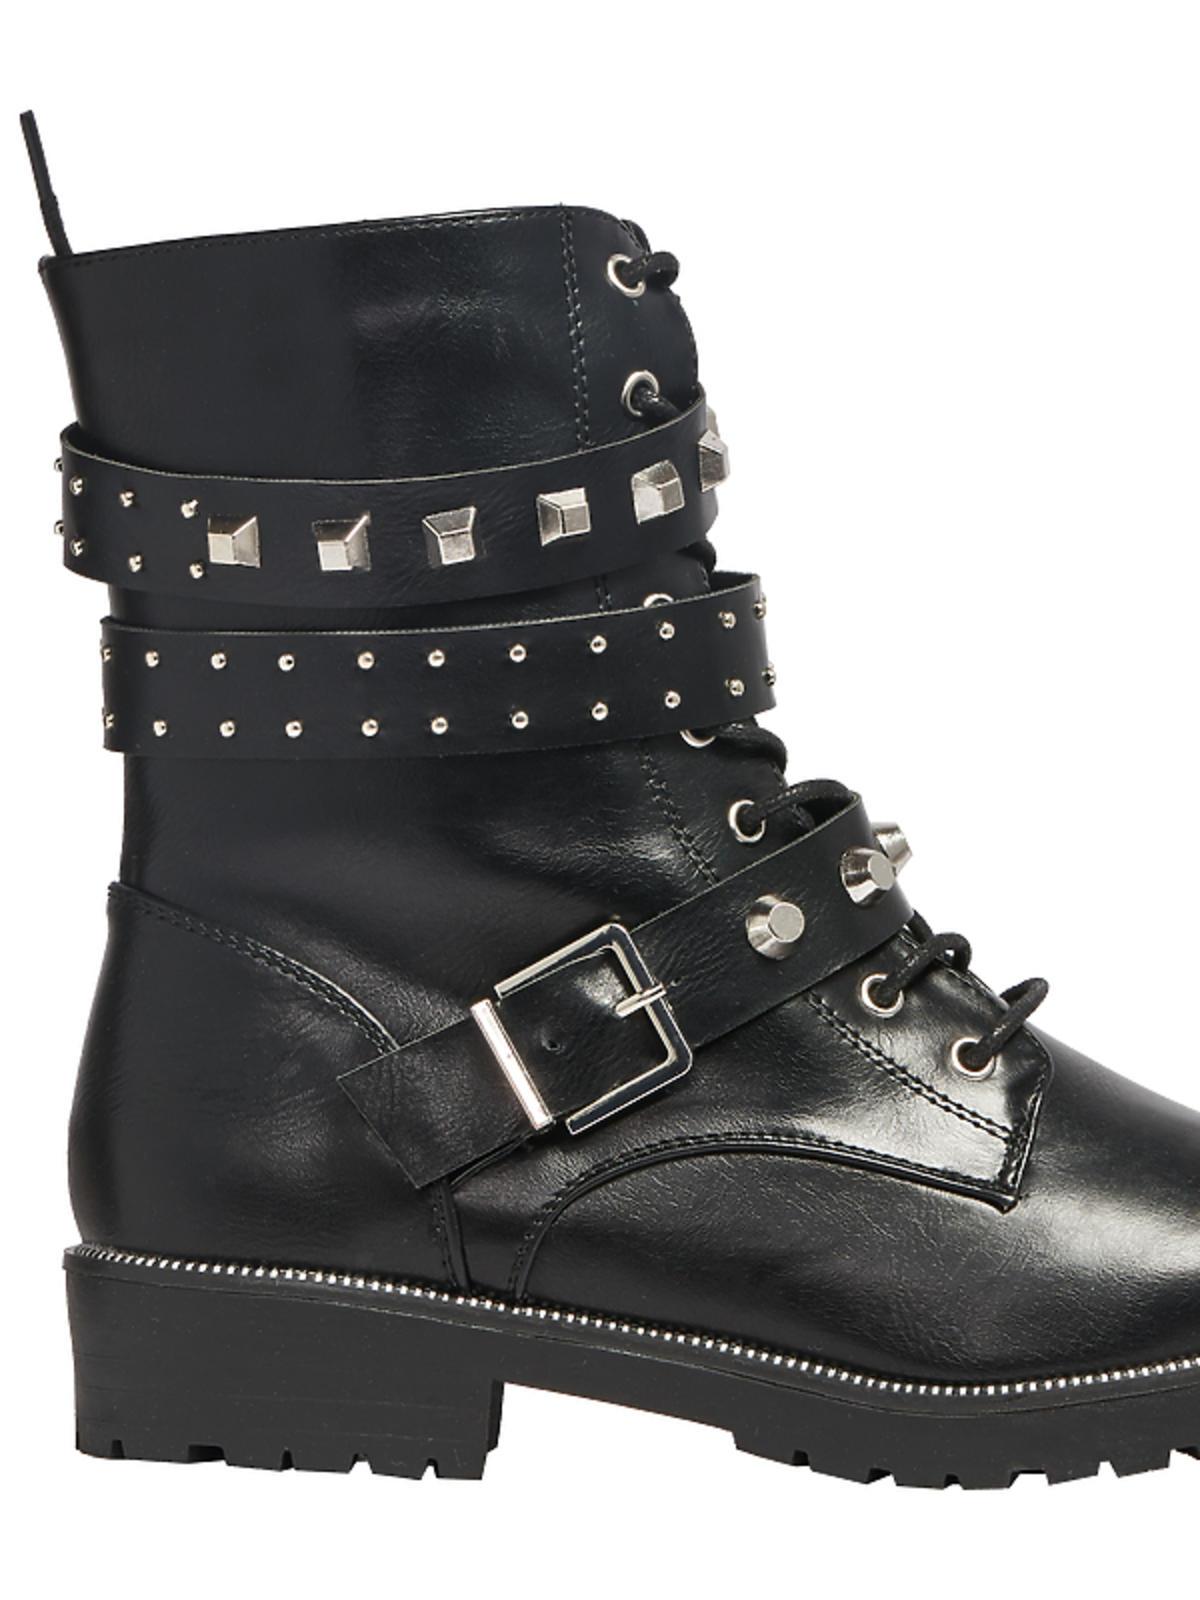 buty z klamerkami Sinsay